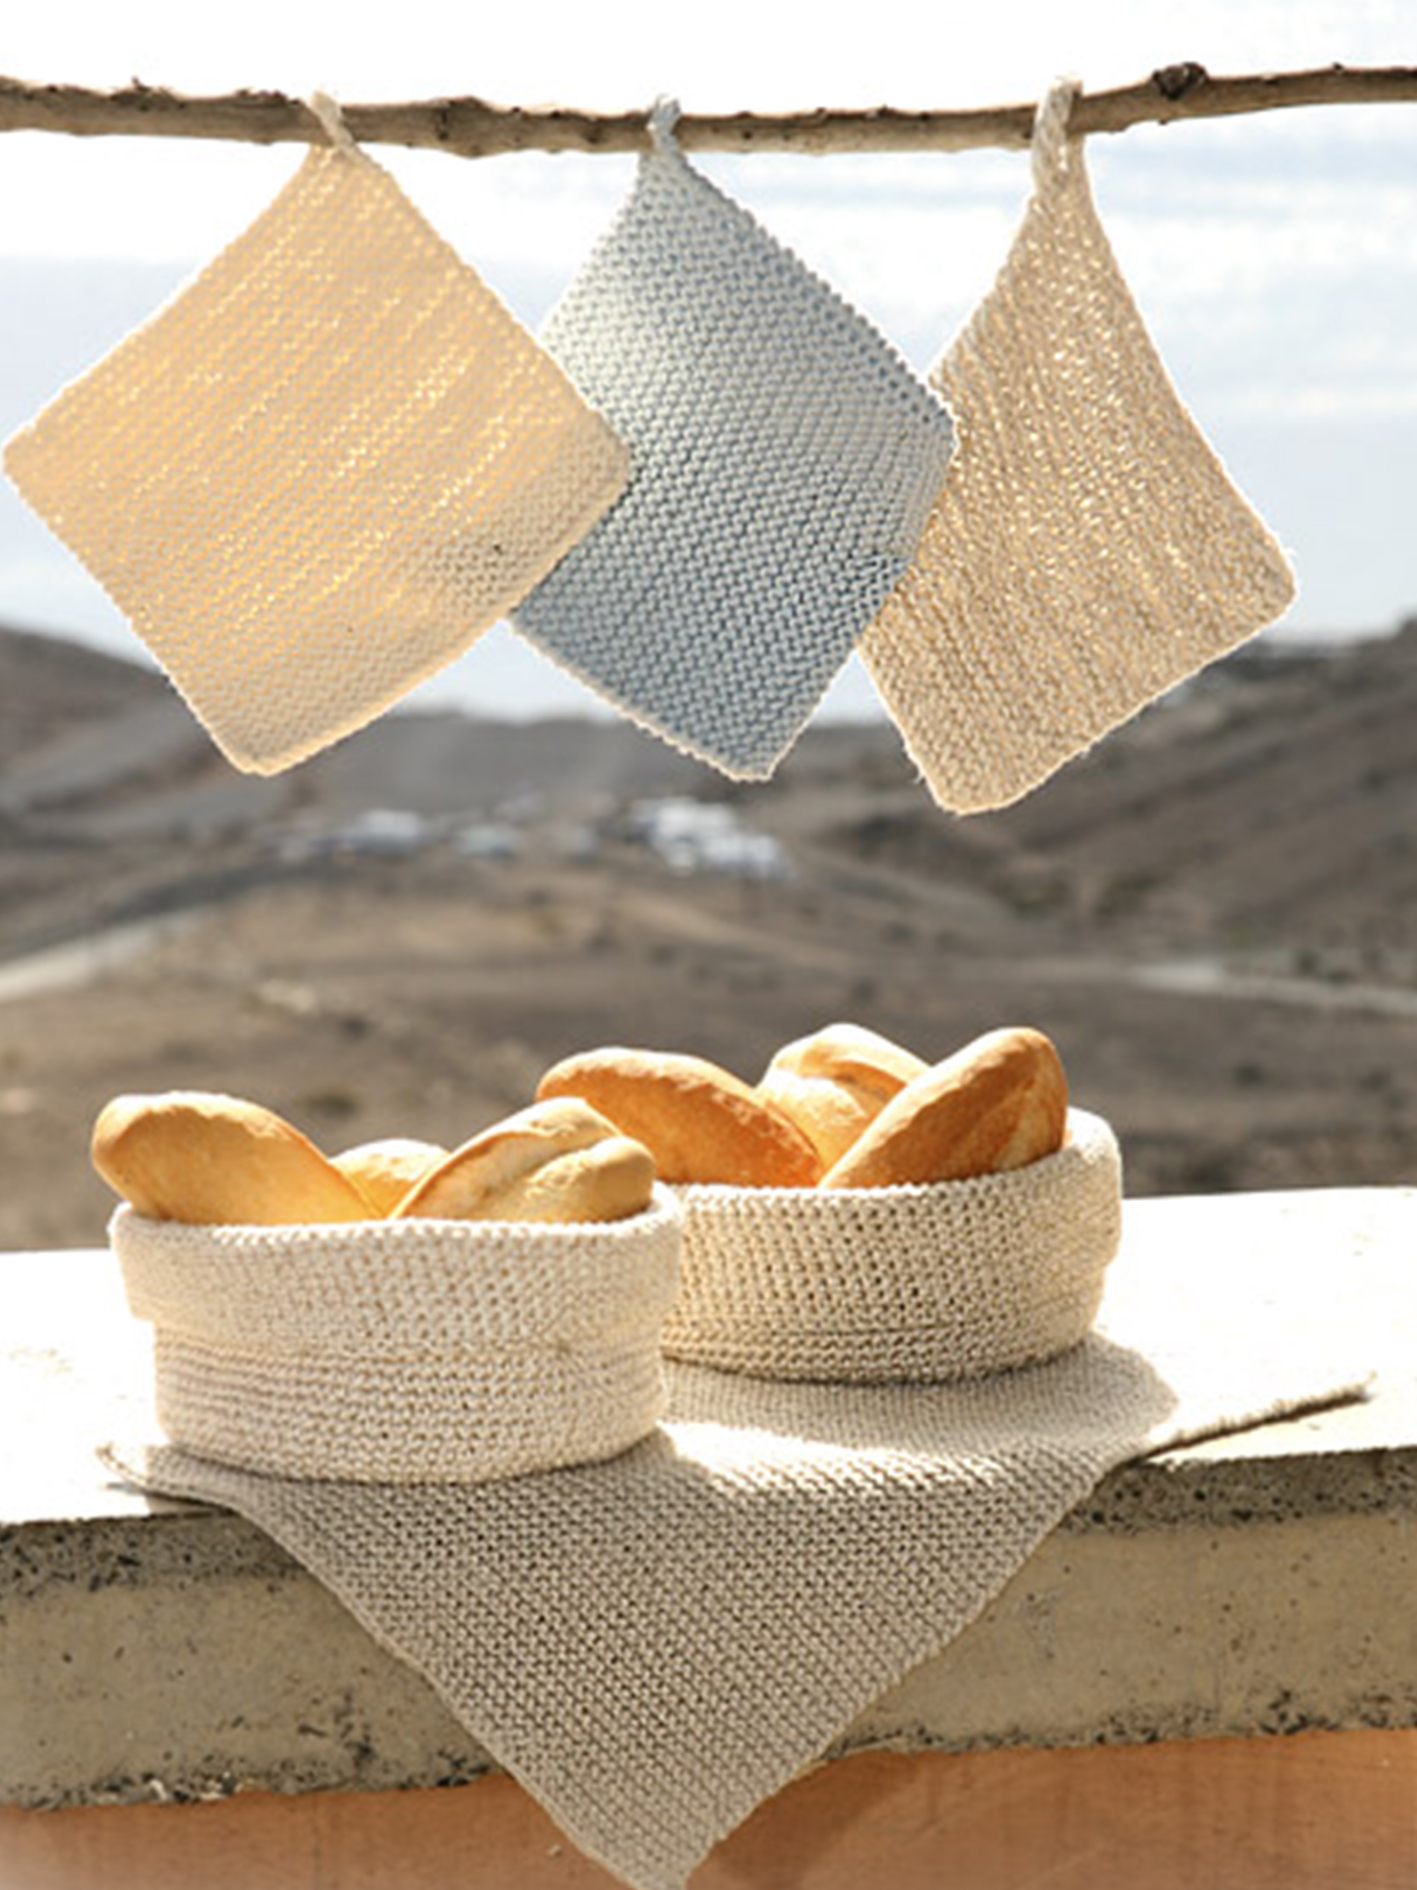 free-crochet-basket-pattern-large-handles-storage-basket-models-35-new-idea-2019